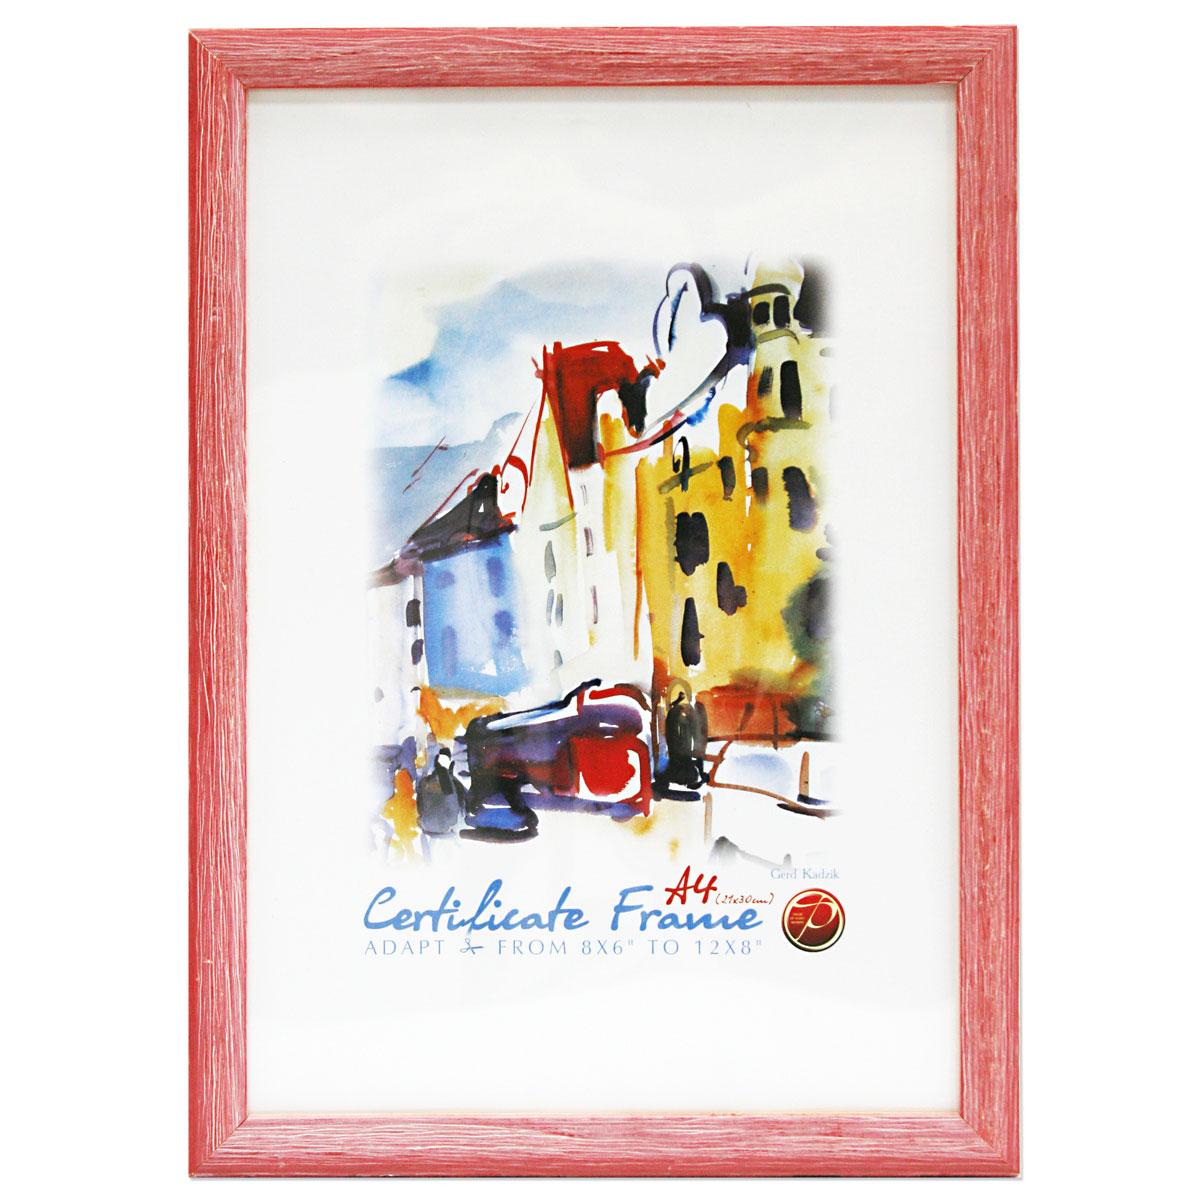 Фоторамка Pioneer Adele, цвет: темно-розовый, 30 х 40 см фоторамка pioneer poster silver для фото 40 x 50 см